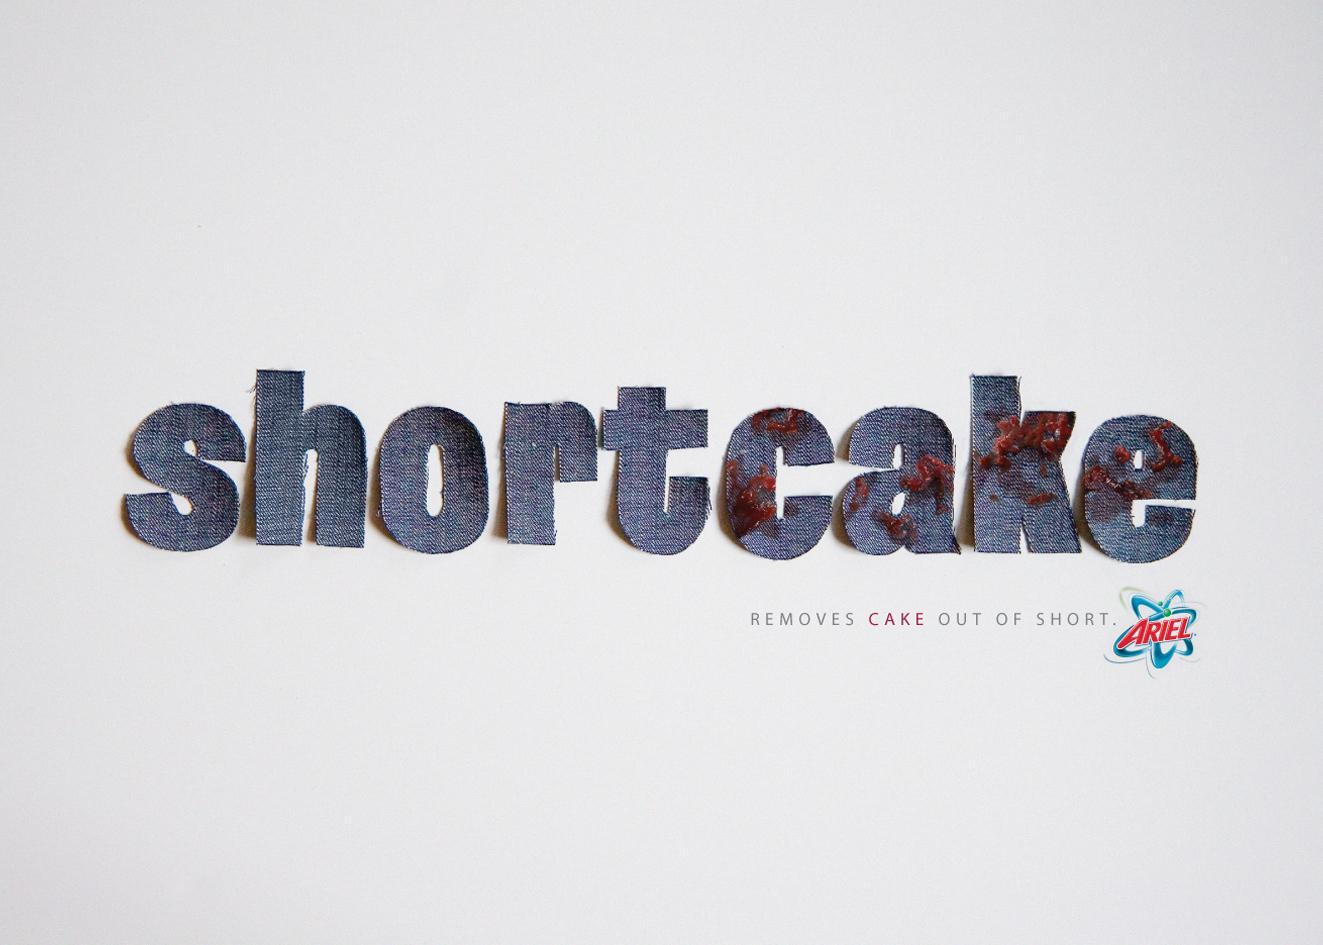 Ariel Print Ad -  Shortcake